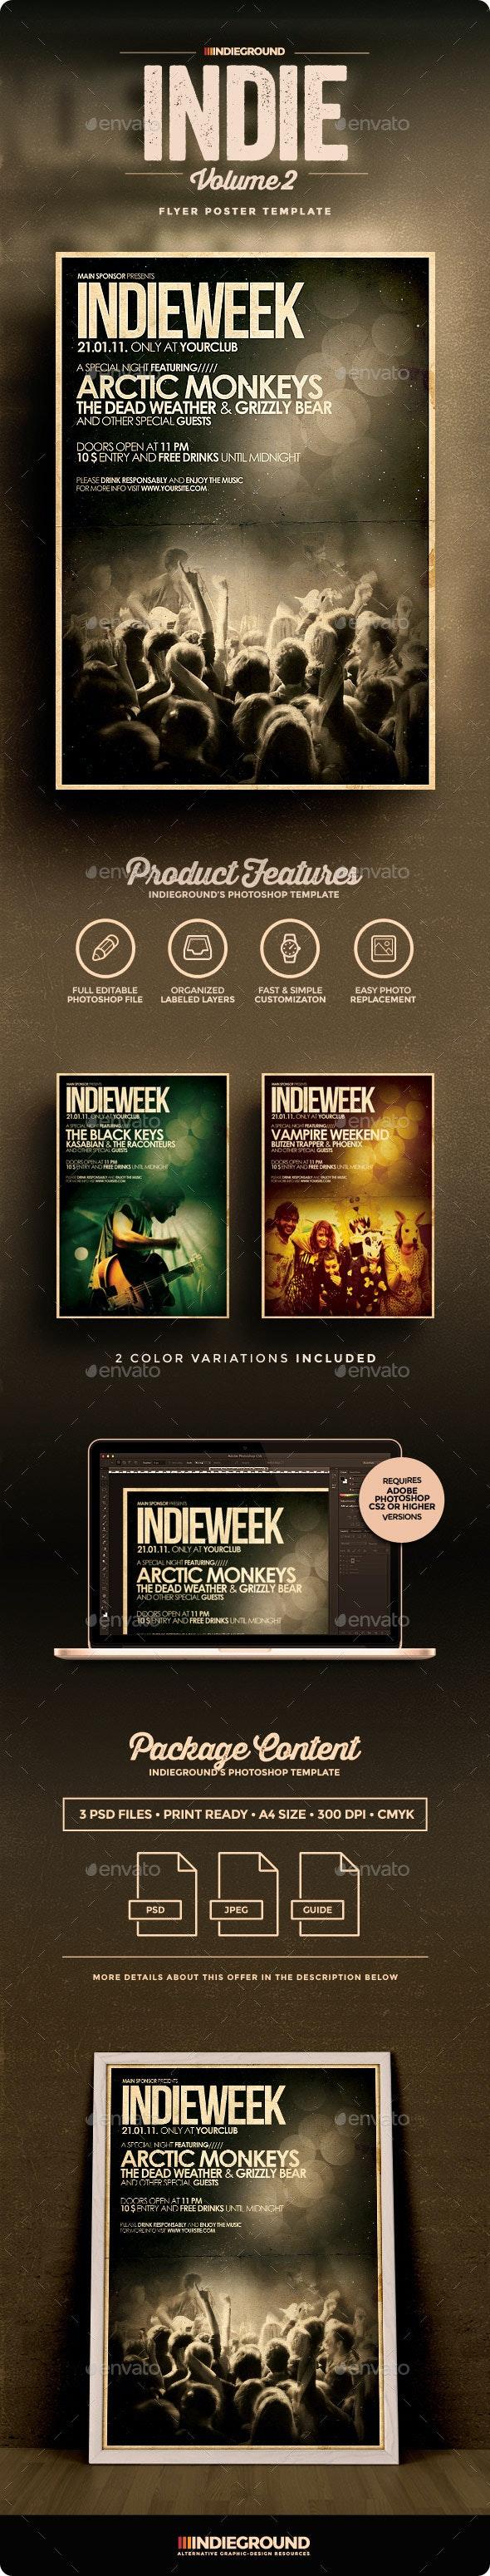 Indie Flyer/Poster Vol. 2 - Concerts Events